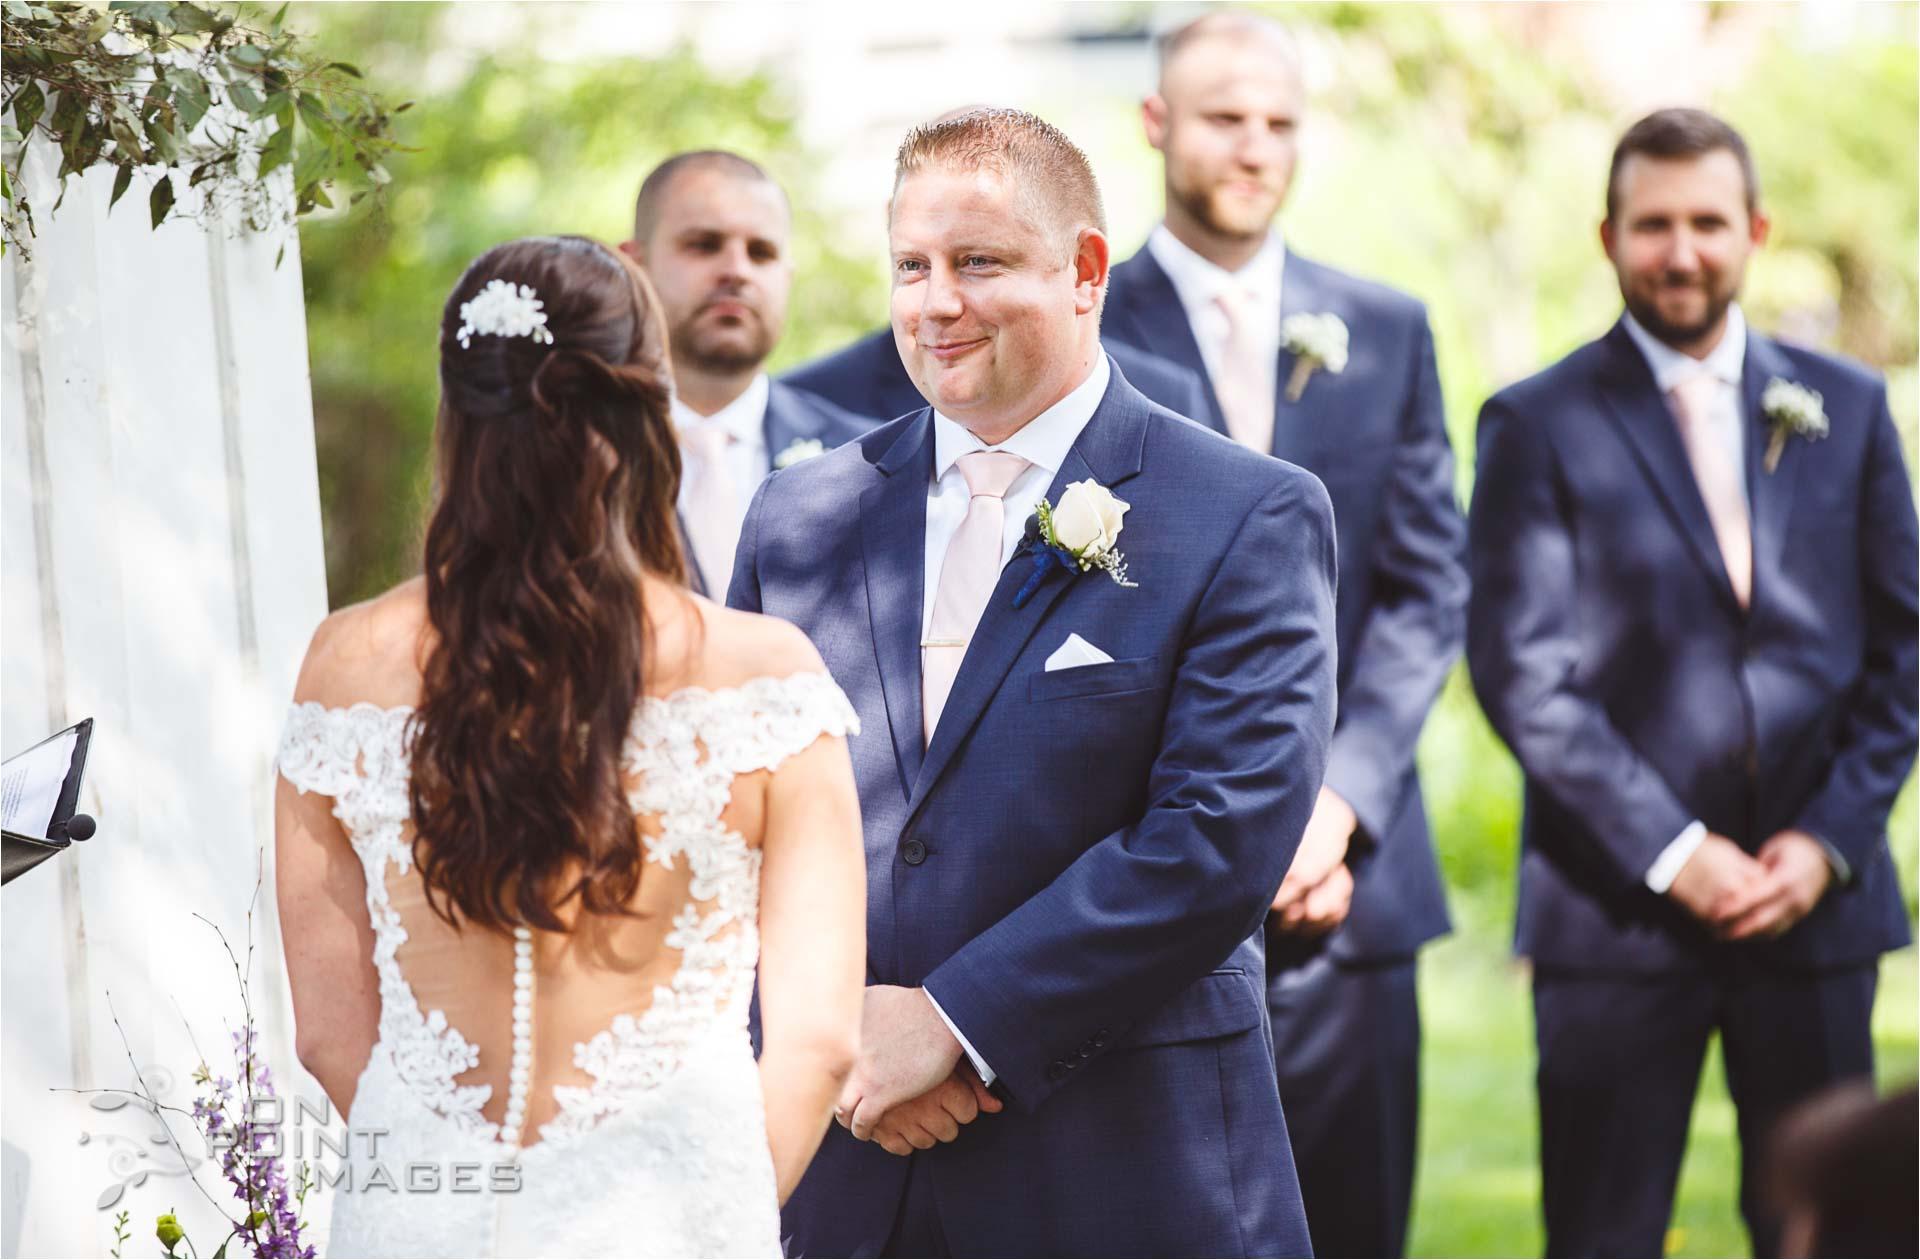 Webb-Barn-Wedding-Photographer-15.jpg